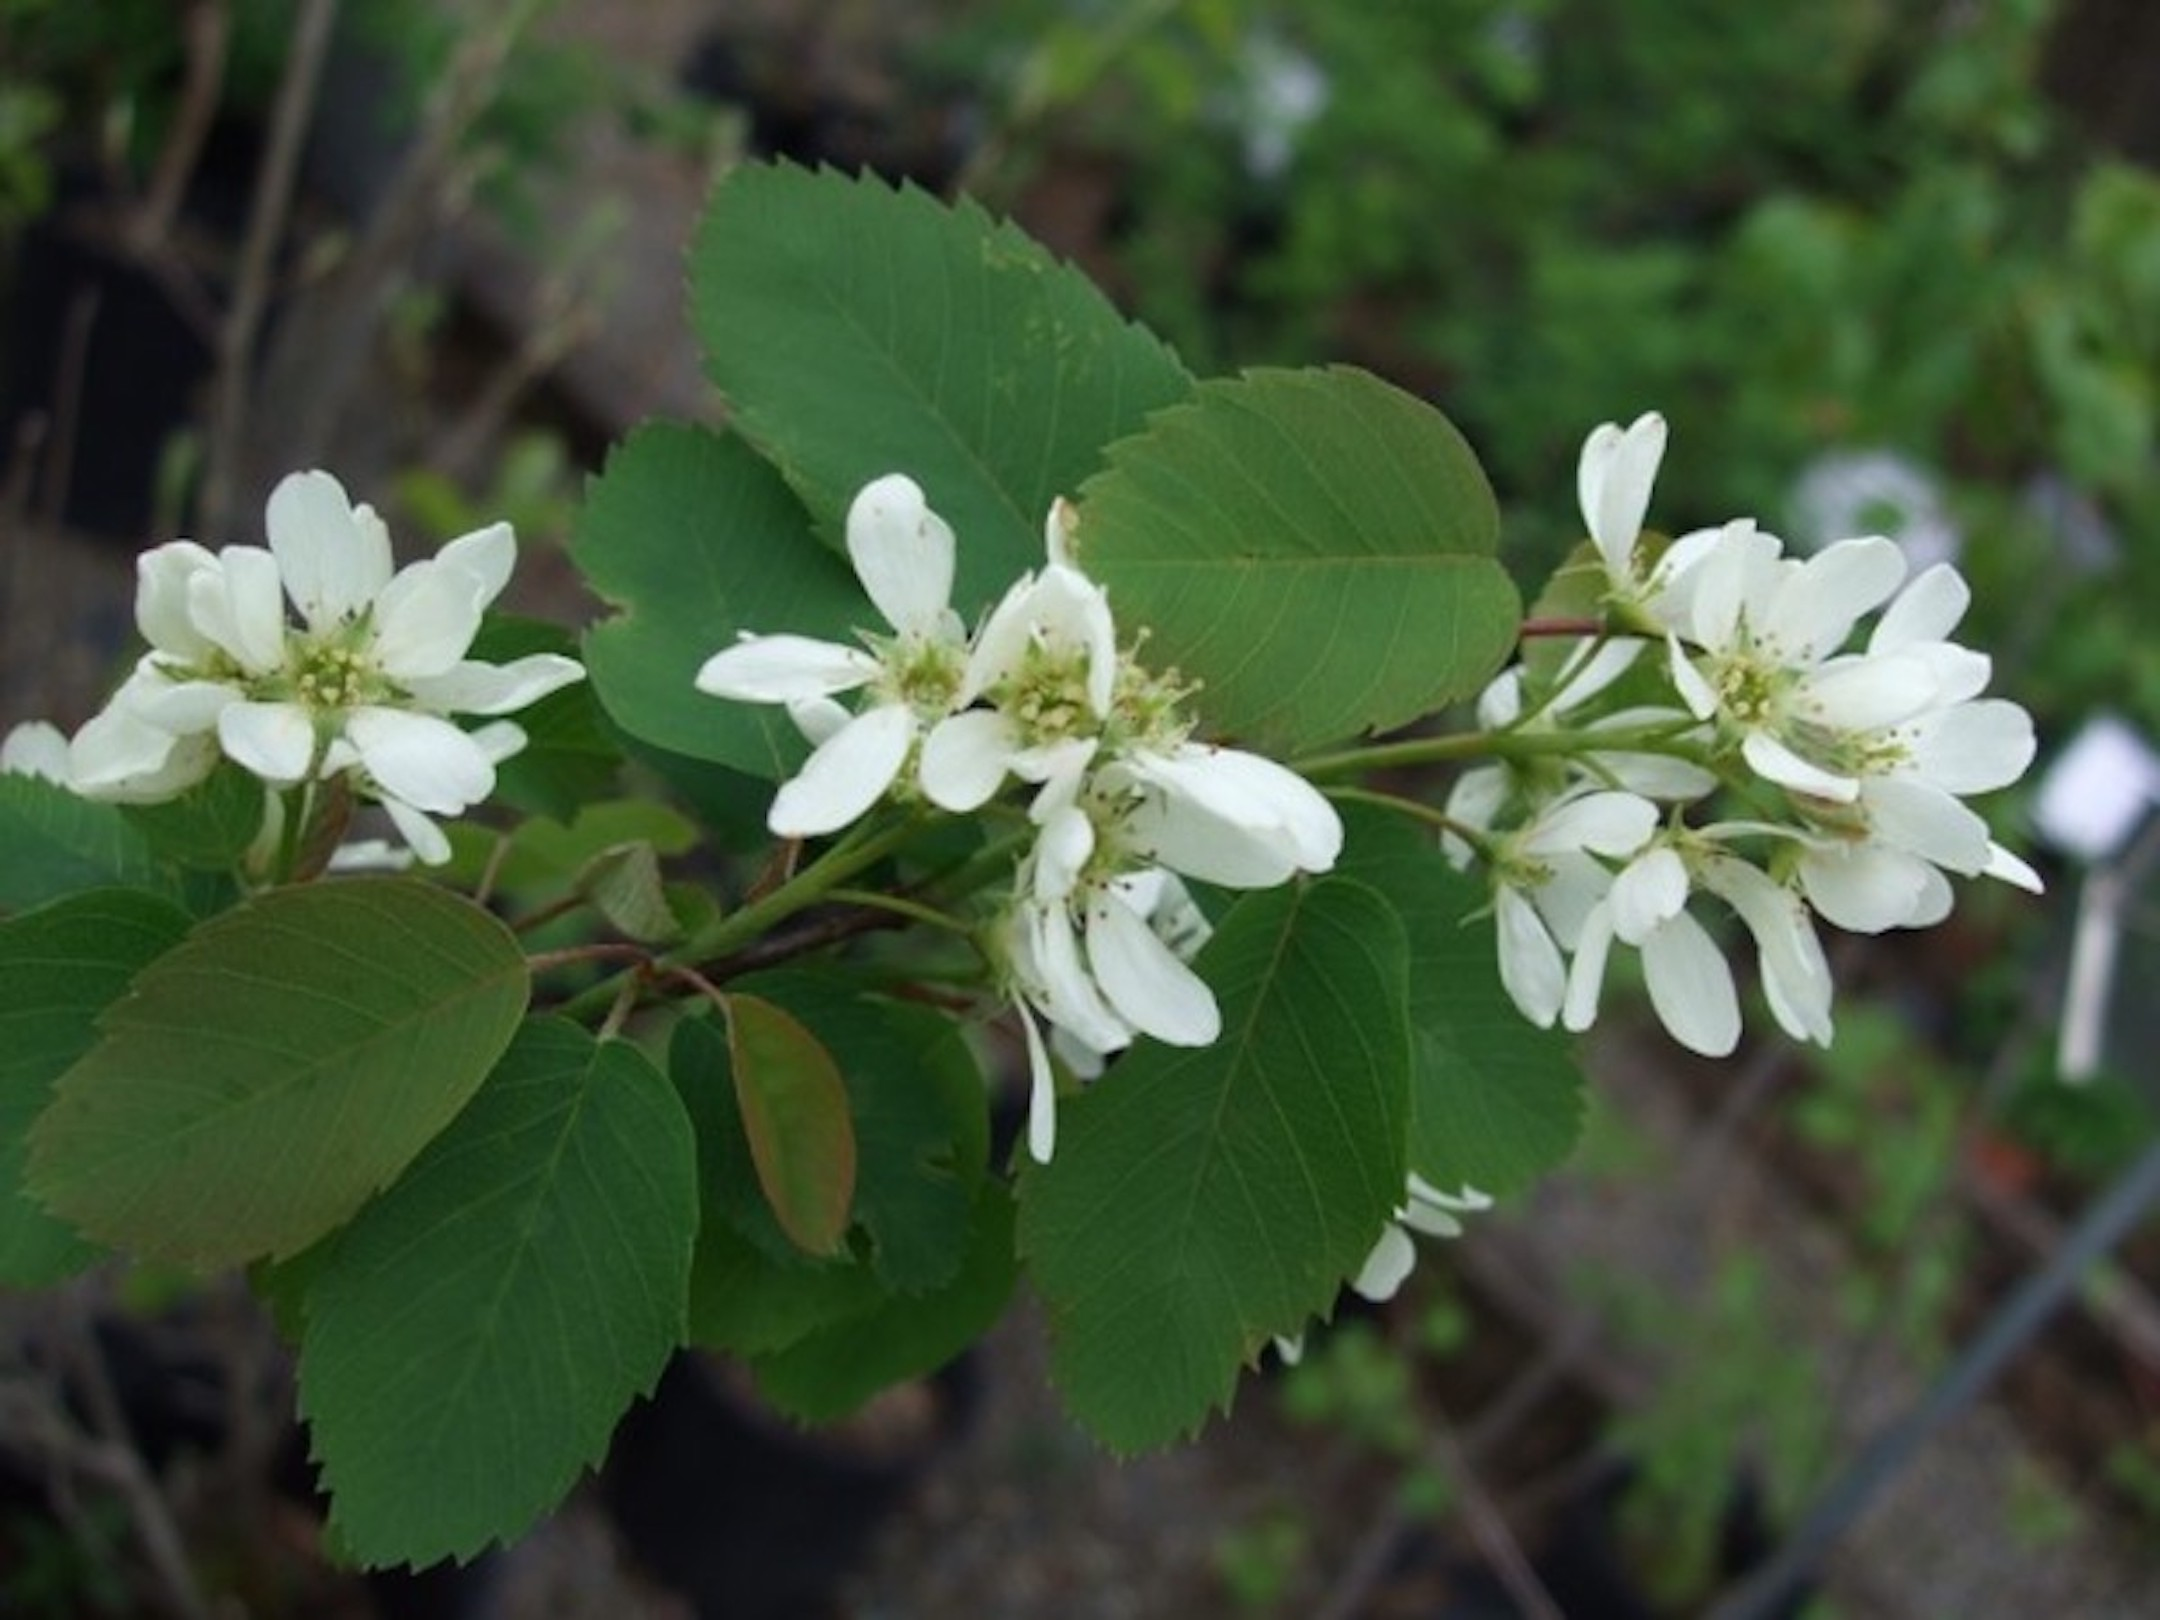 Amelanchier-alnifolia-flowers.jpg